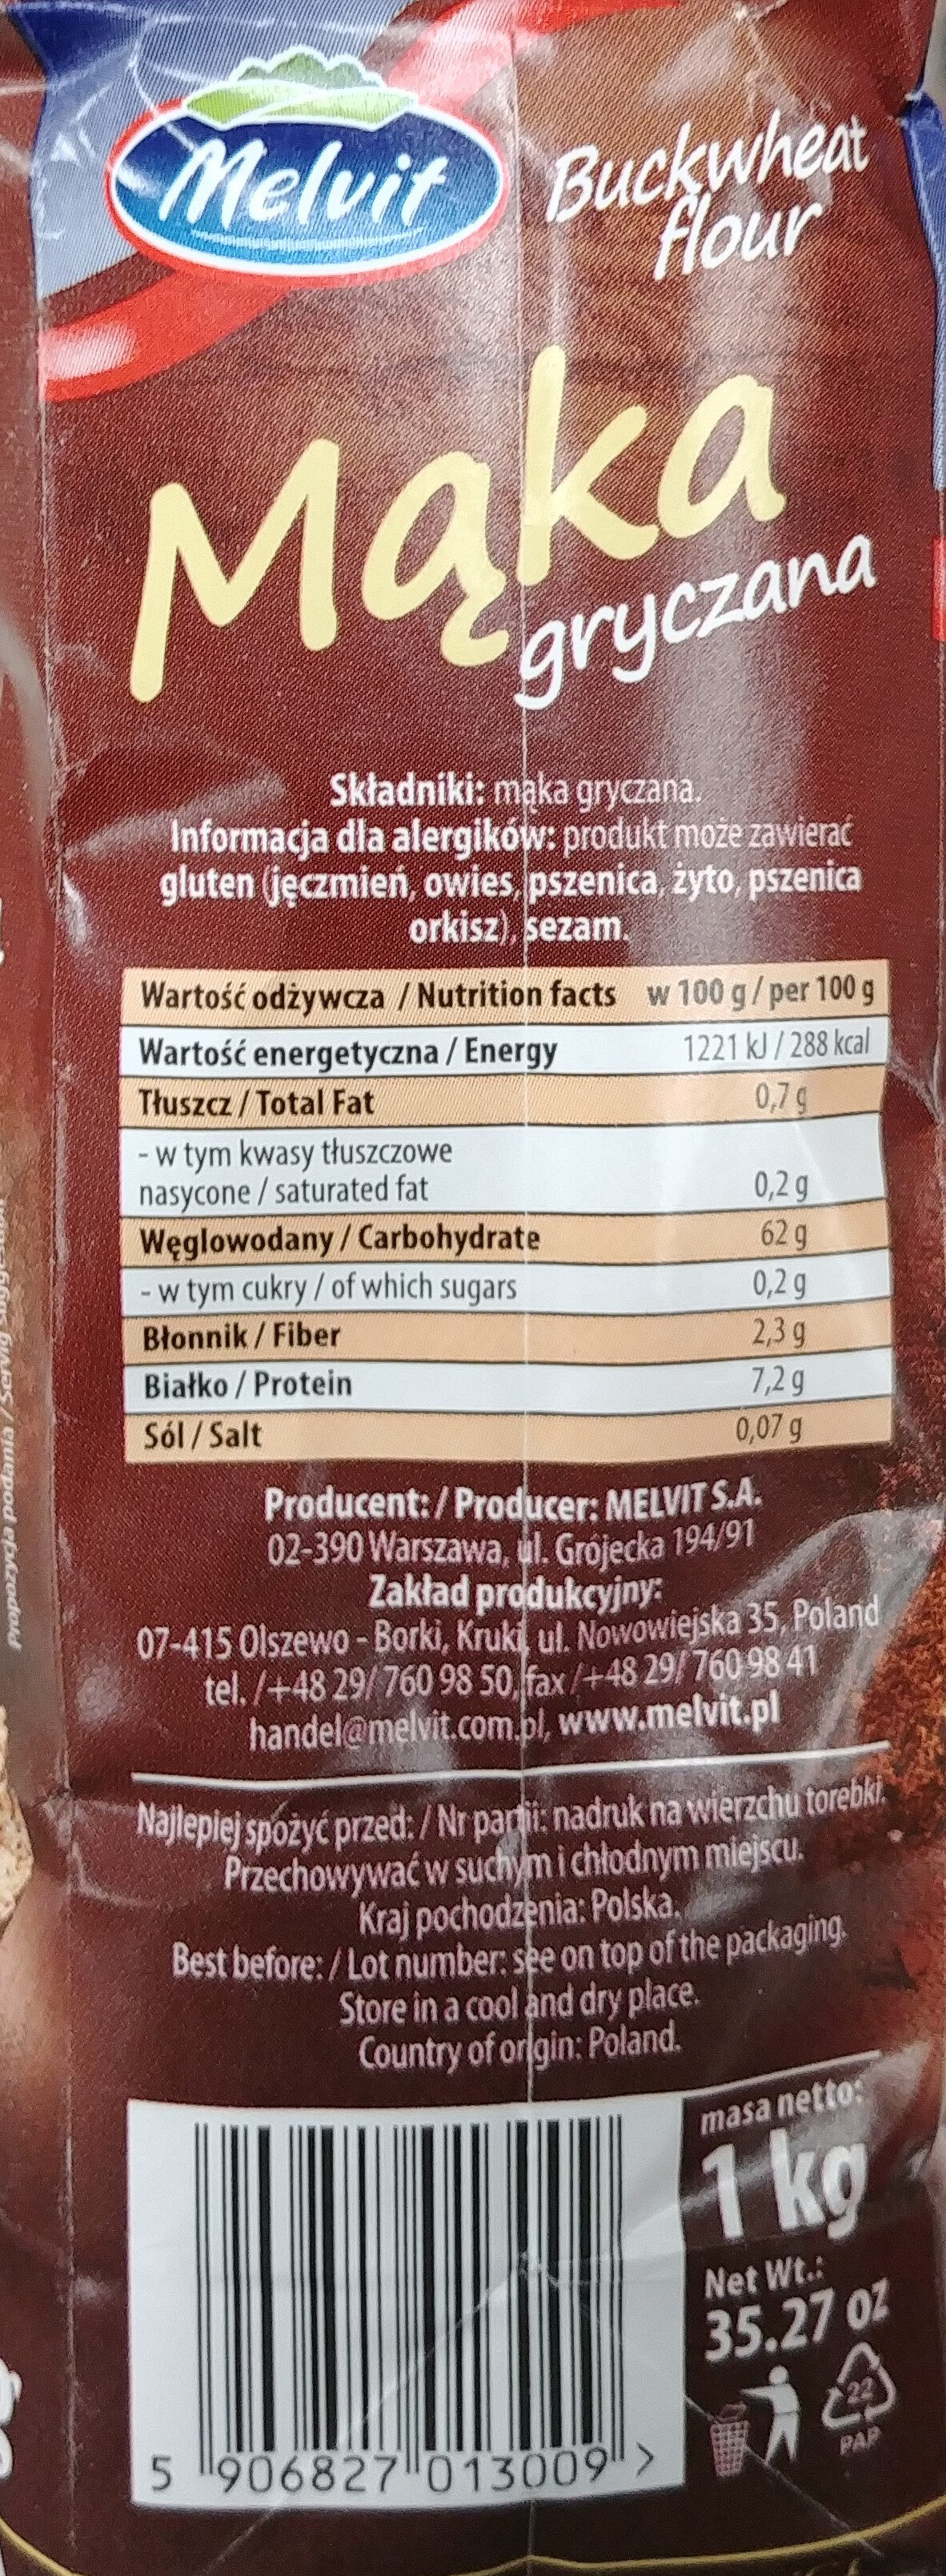 Mąka gryczana - Ingrédients - pl